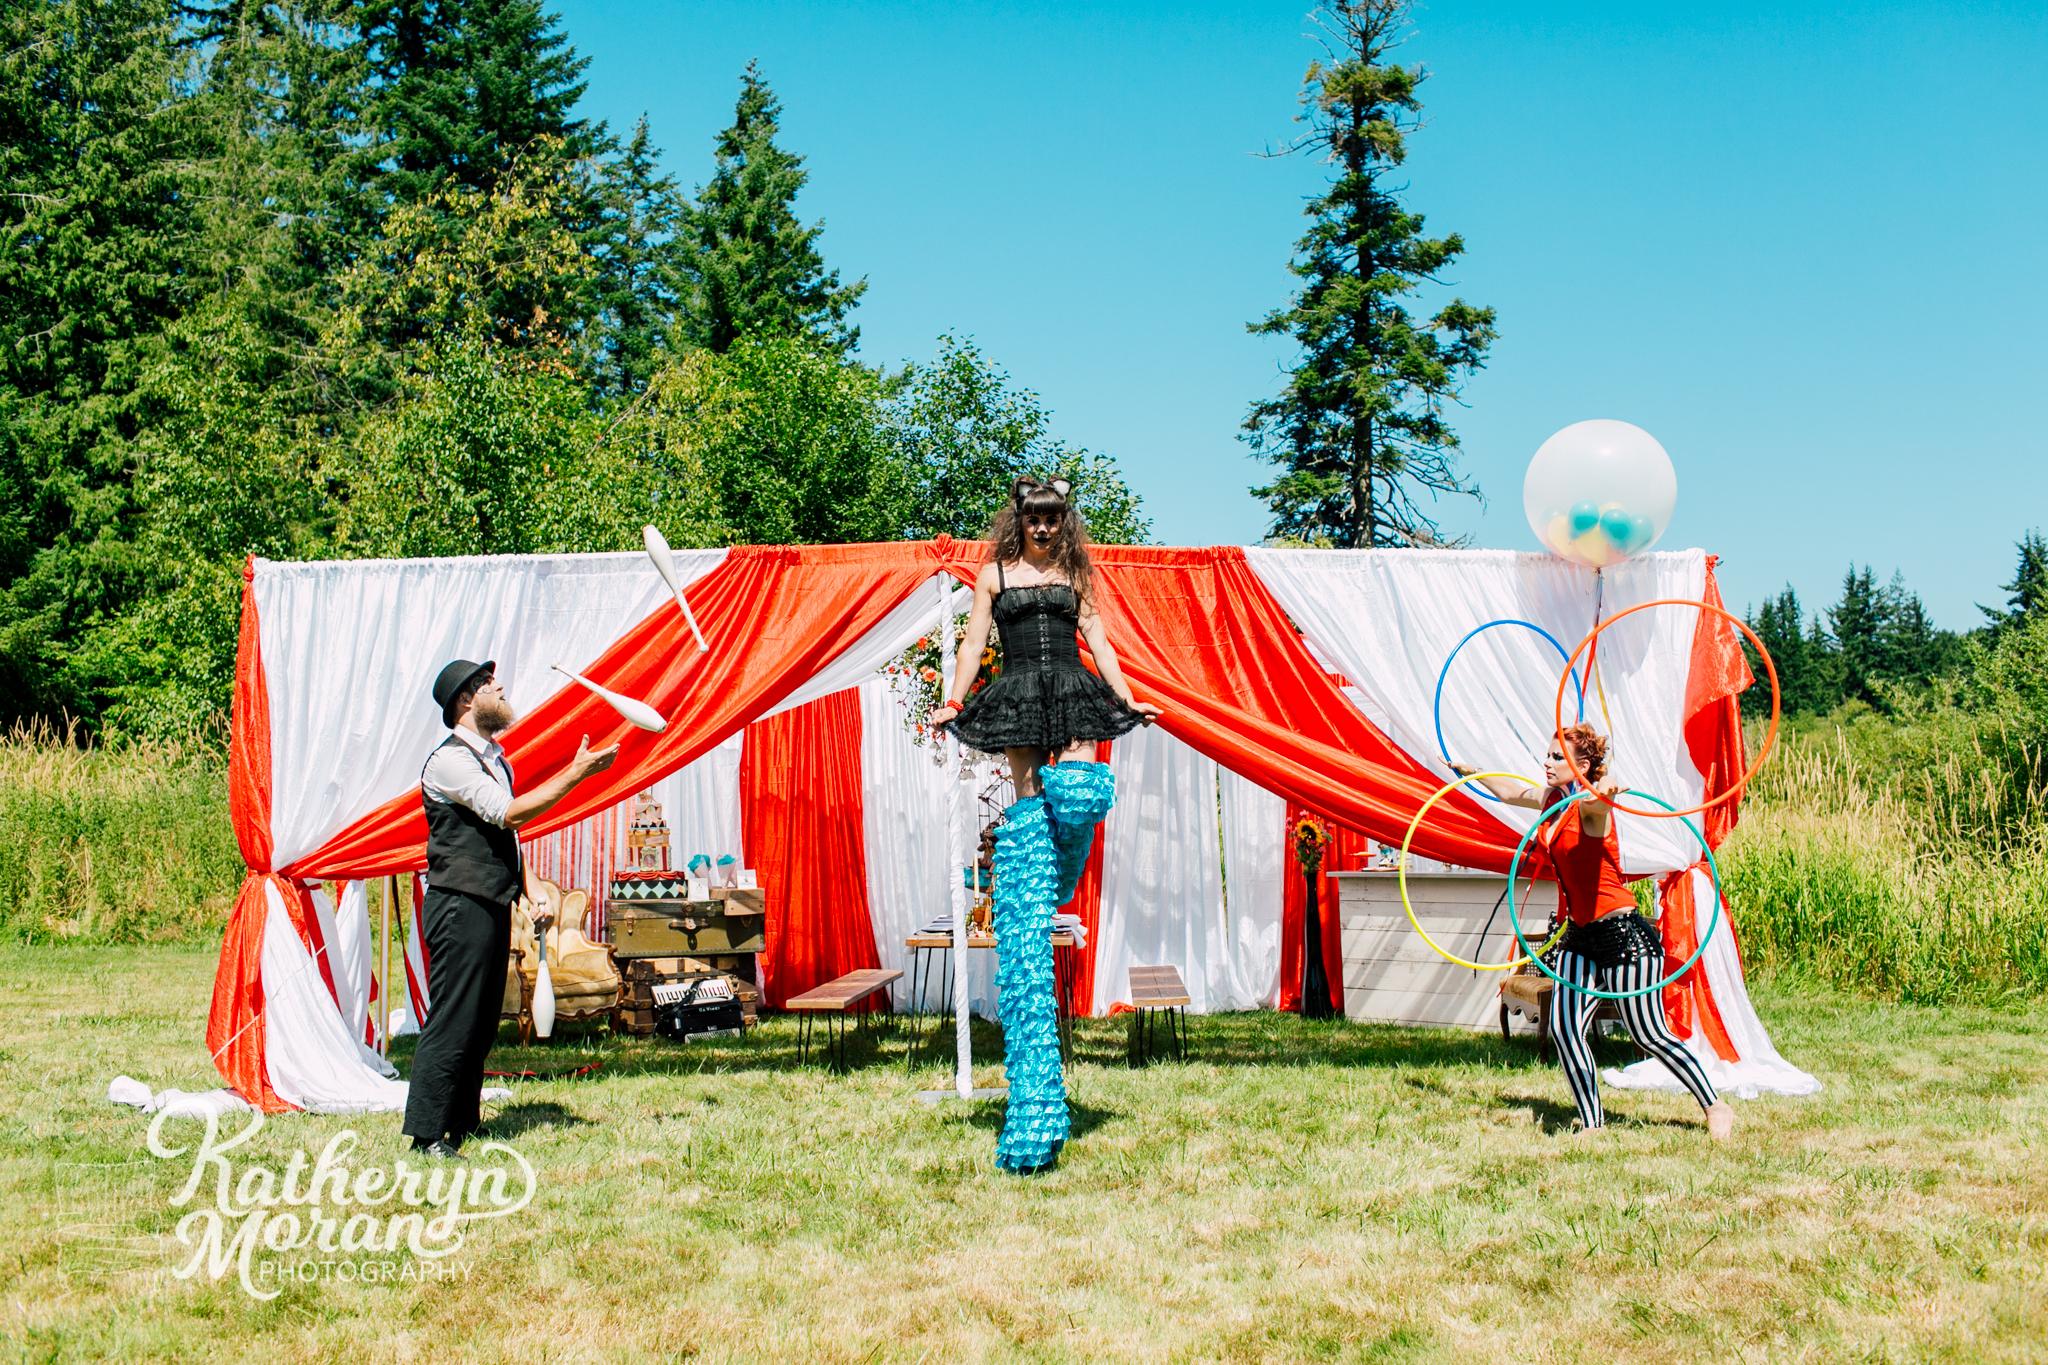 bellingham-seattle-event-photographer-vintage-circus-styled-katheryn-moran-114.jpg